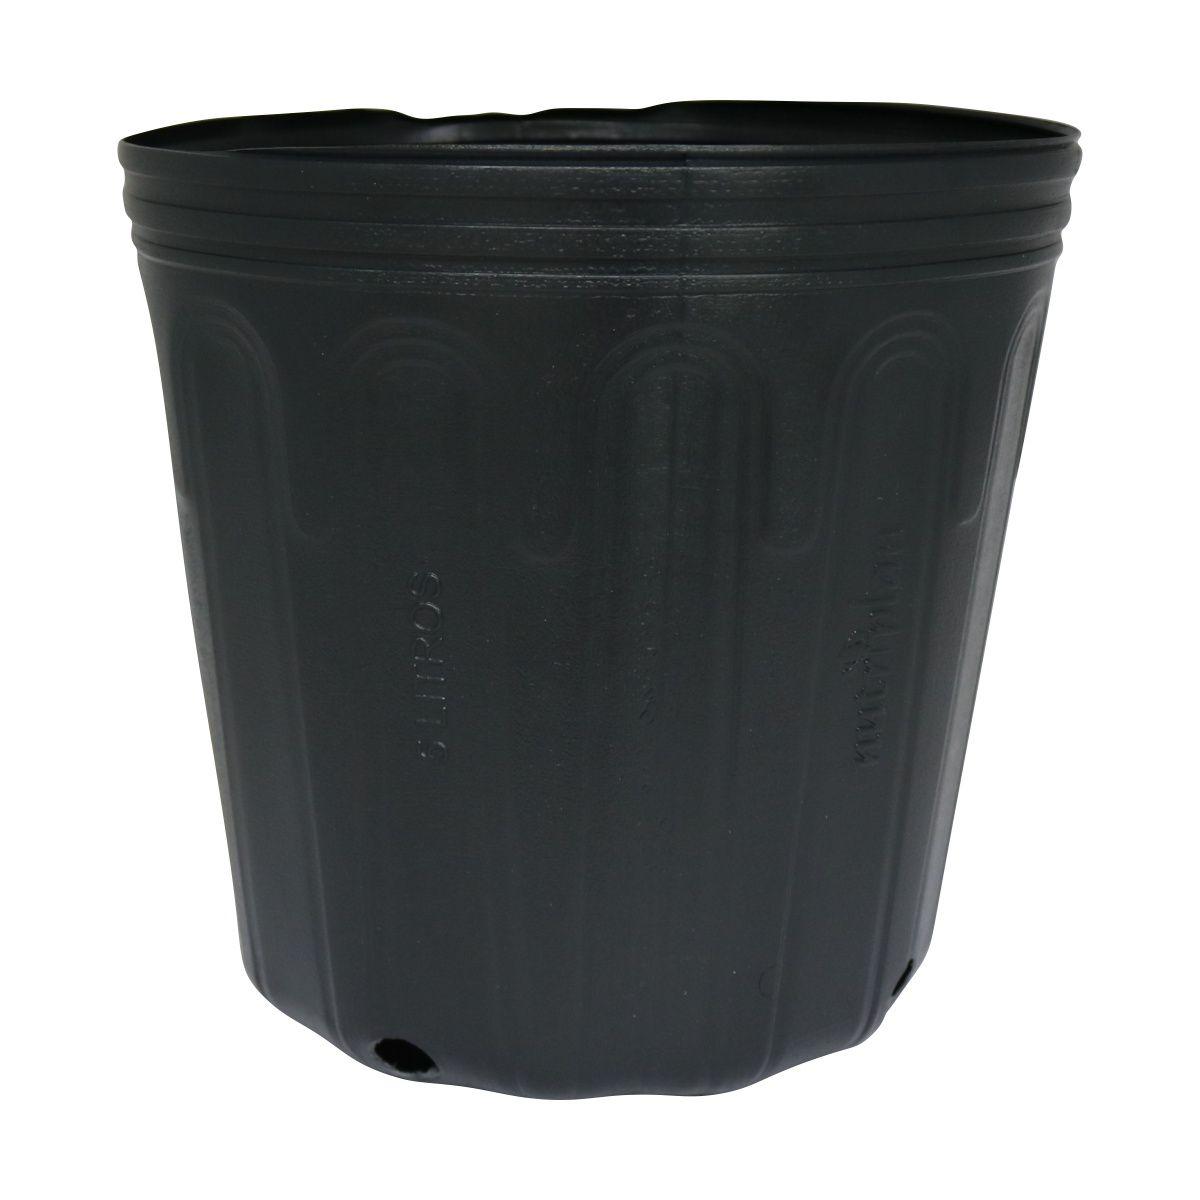 Vaso (embalagem) para mudas pote 5 litros